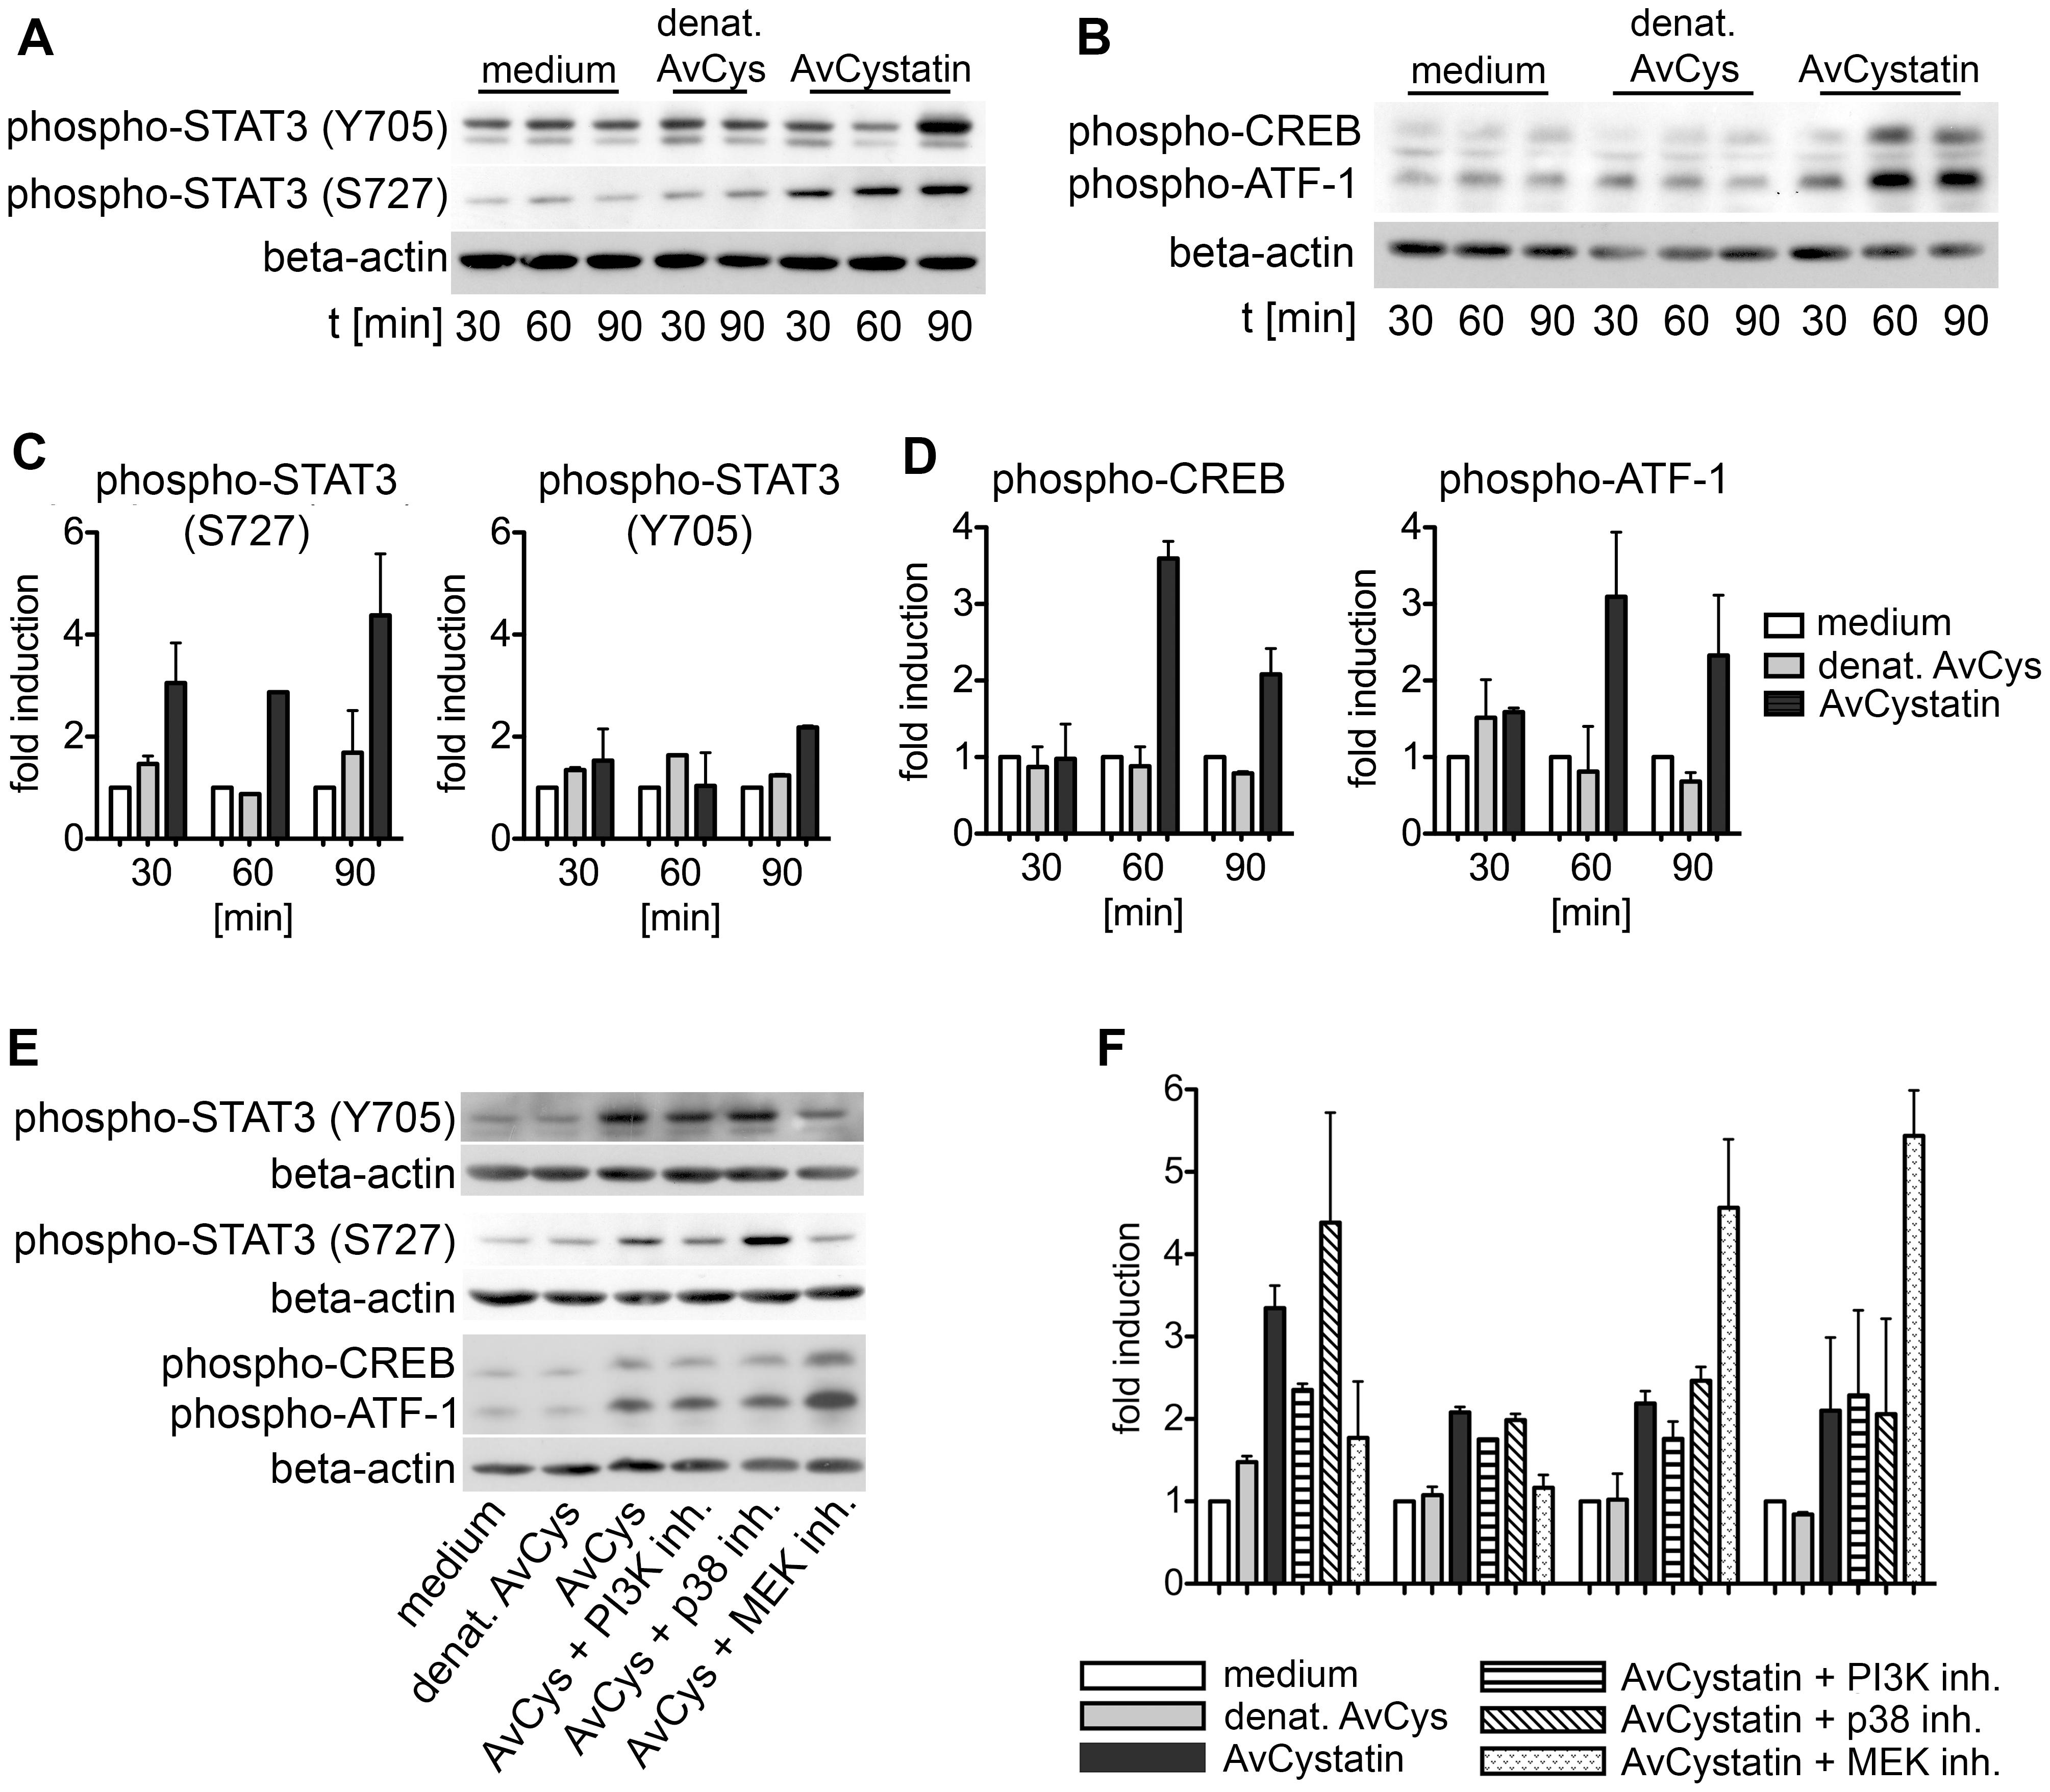 AvCystatin induces phosphorylation of transcription factors CREB and STAT3.